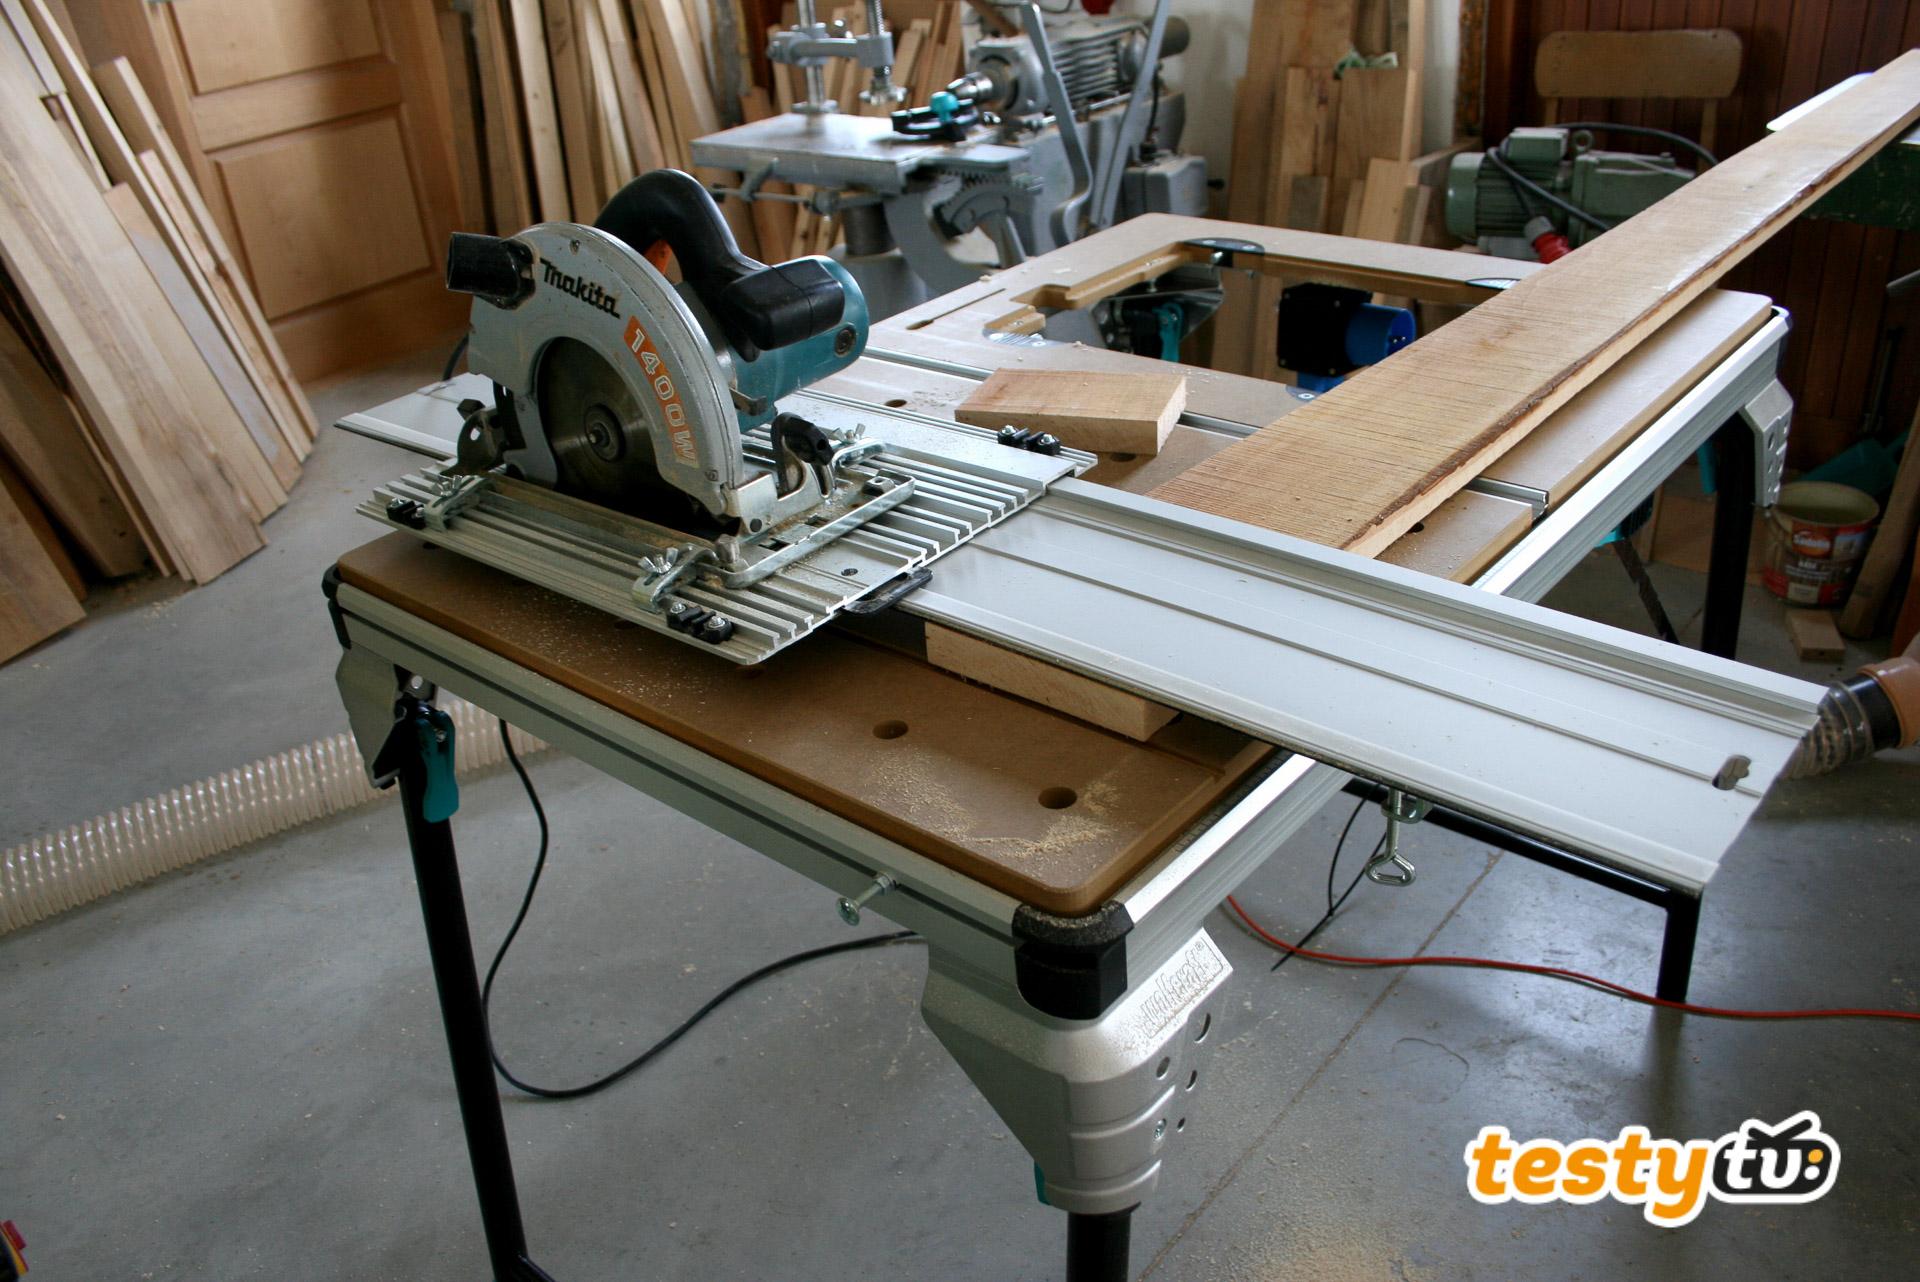 wolfcraft master cut 2000 precyzyjny st maszynowo. Black Bedroom Furniture Sets. Home Design Ideas